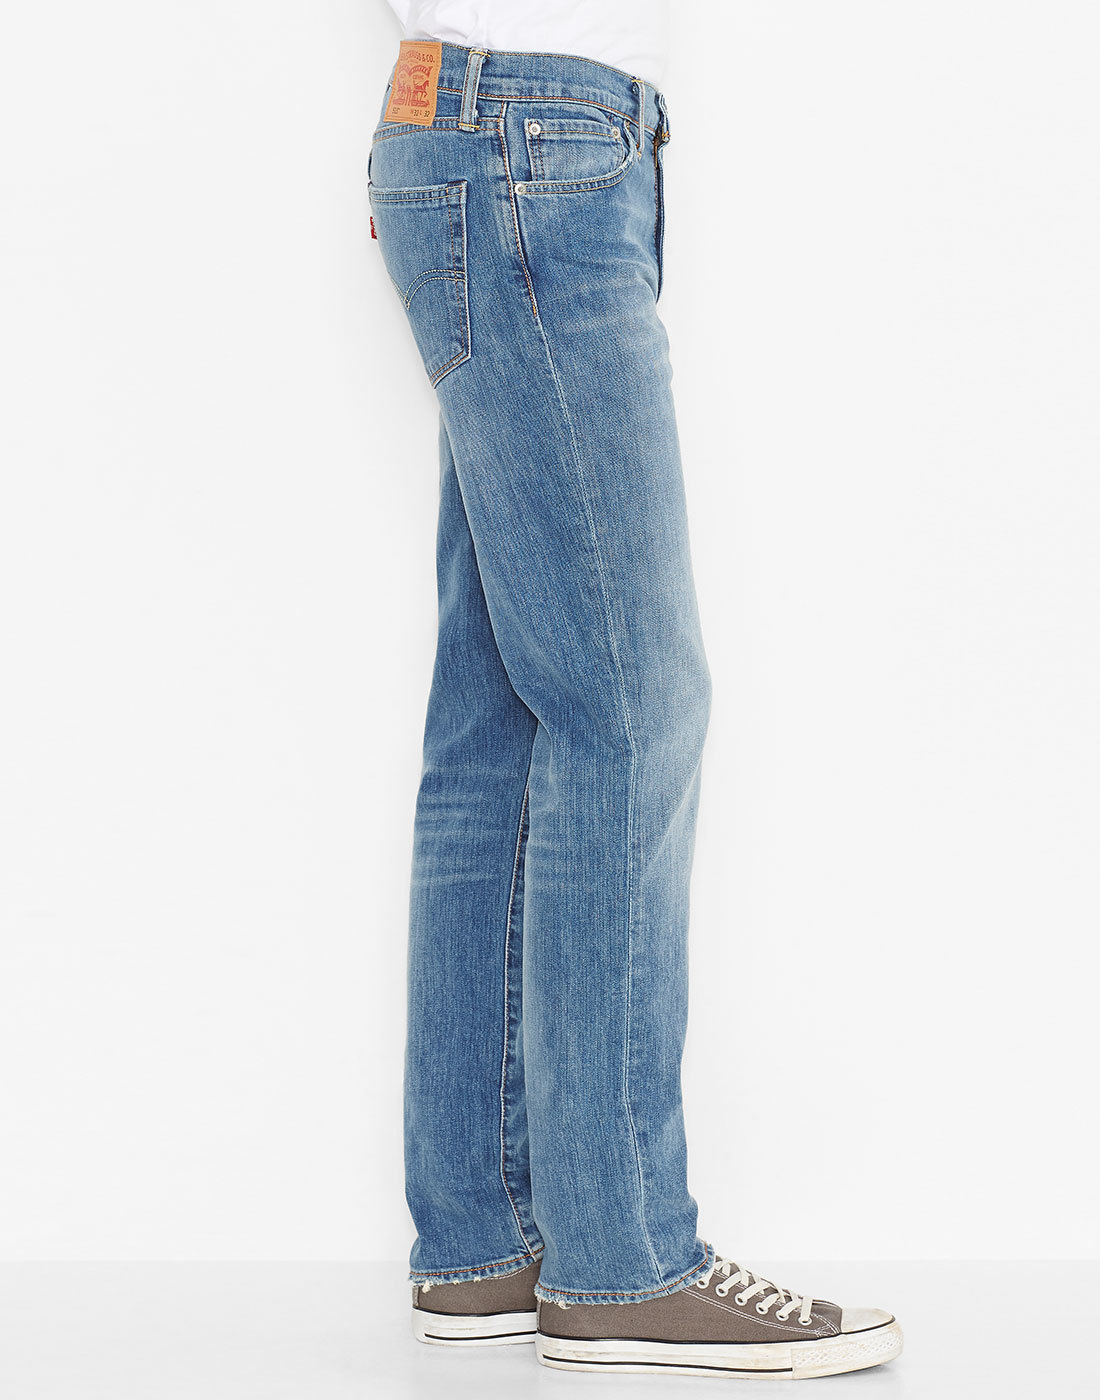 LEVI'S® 511 Retro Slim Fit Mod Denim Jeans in Harbour Blue